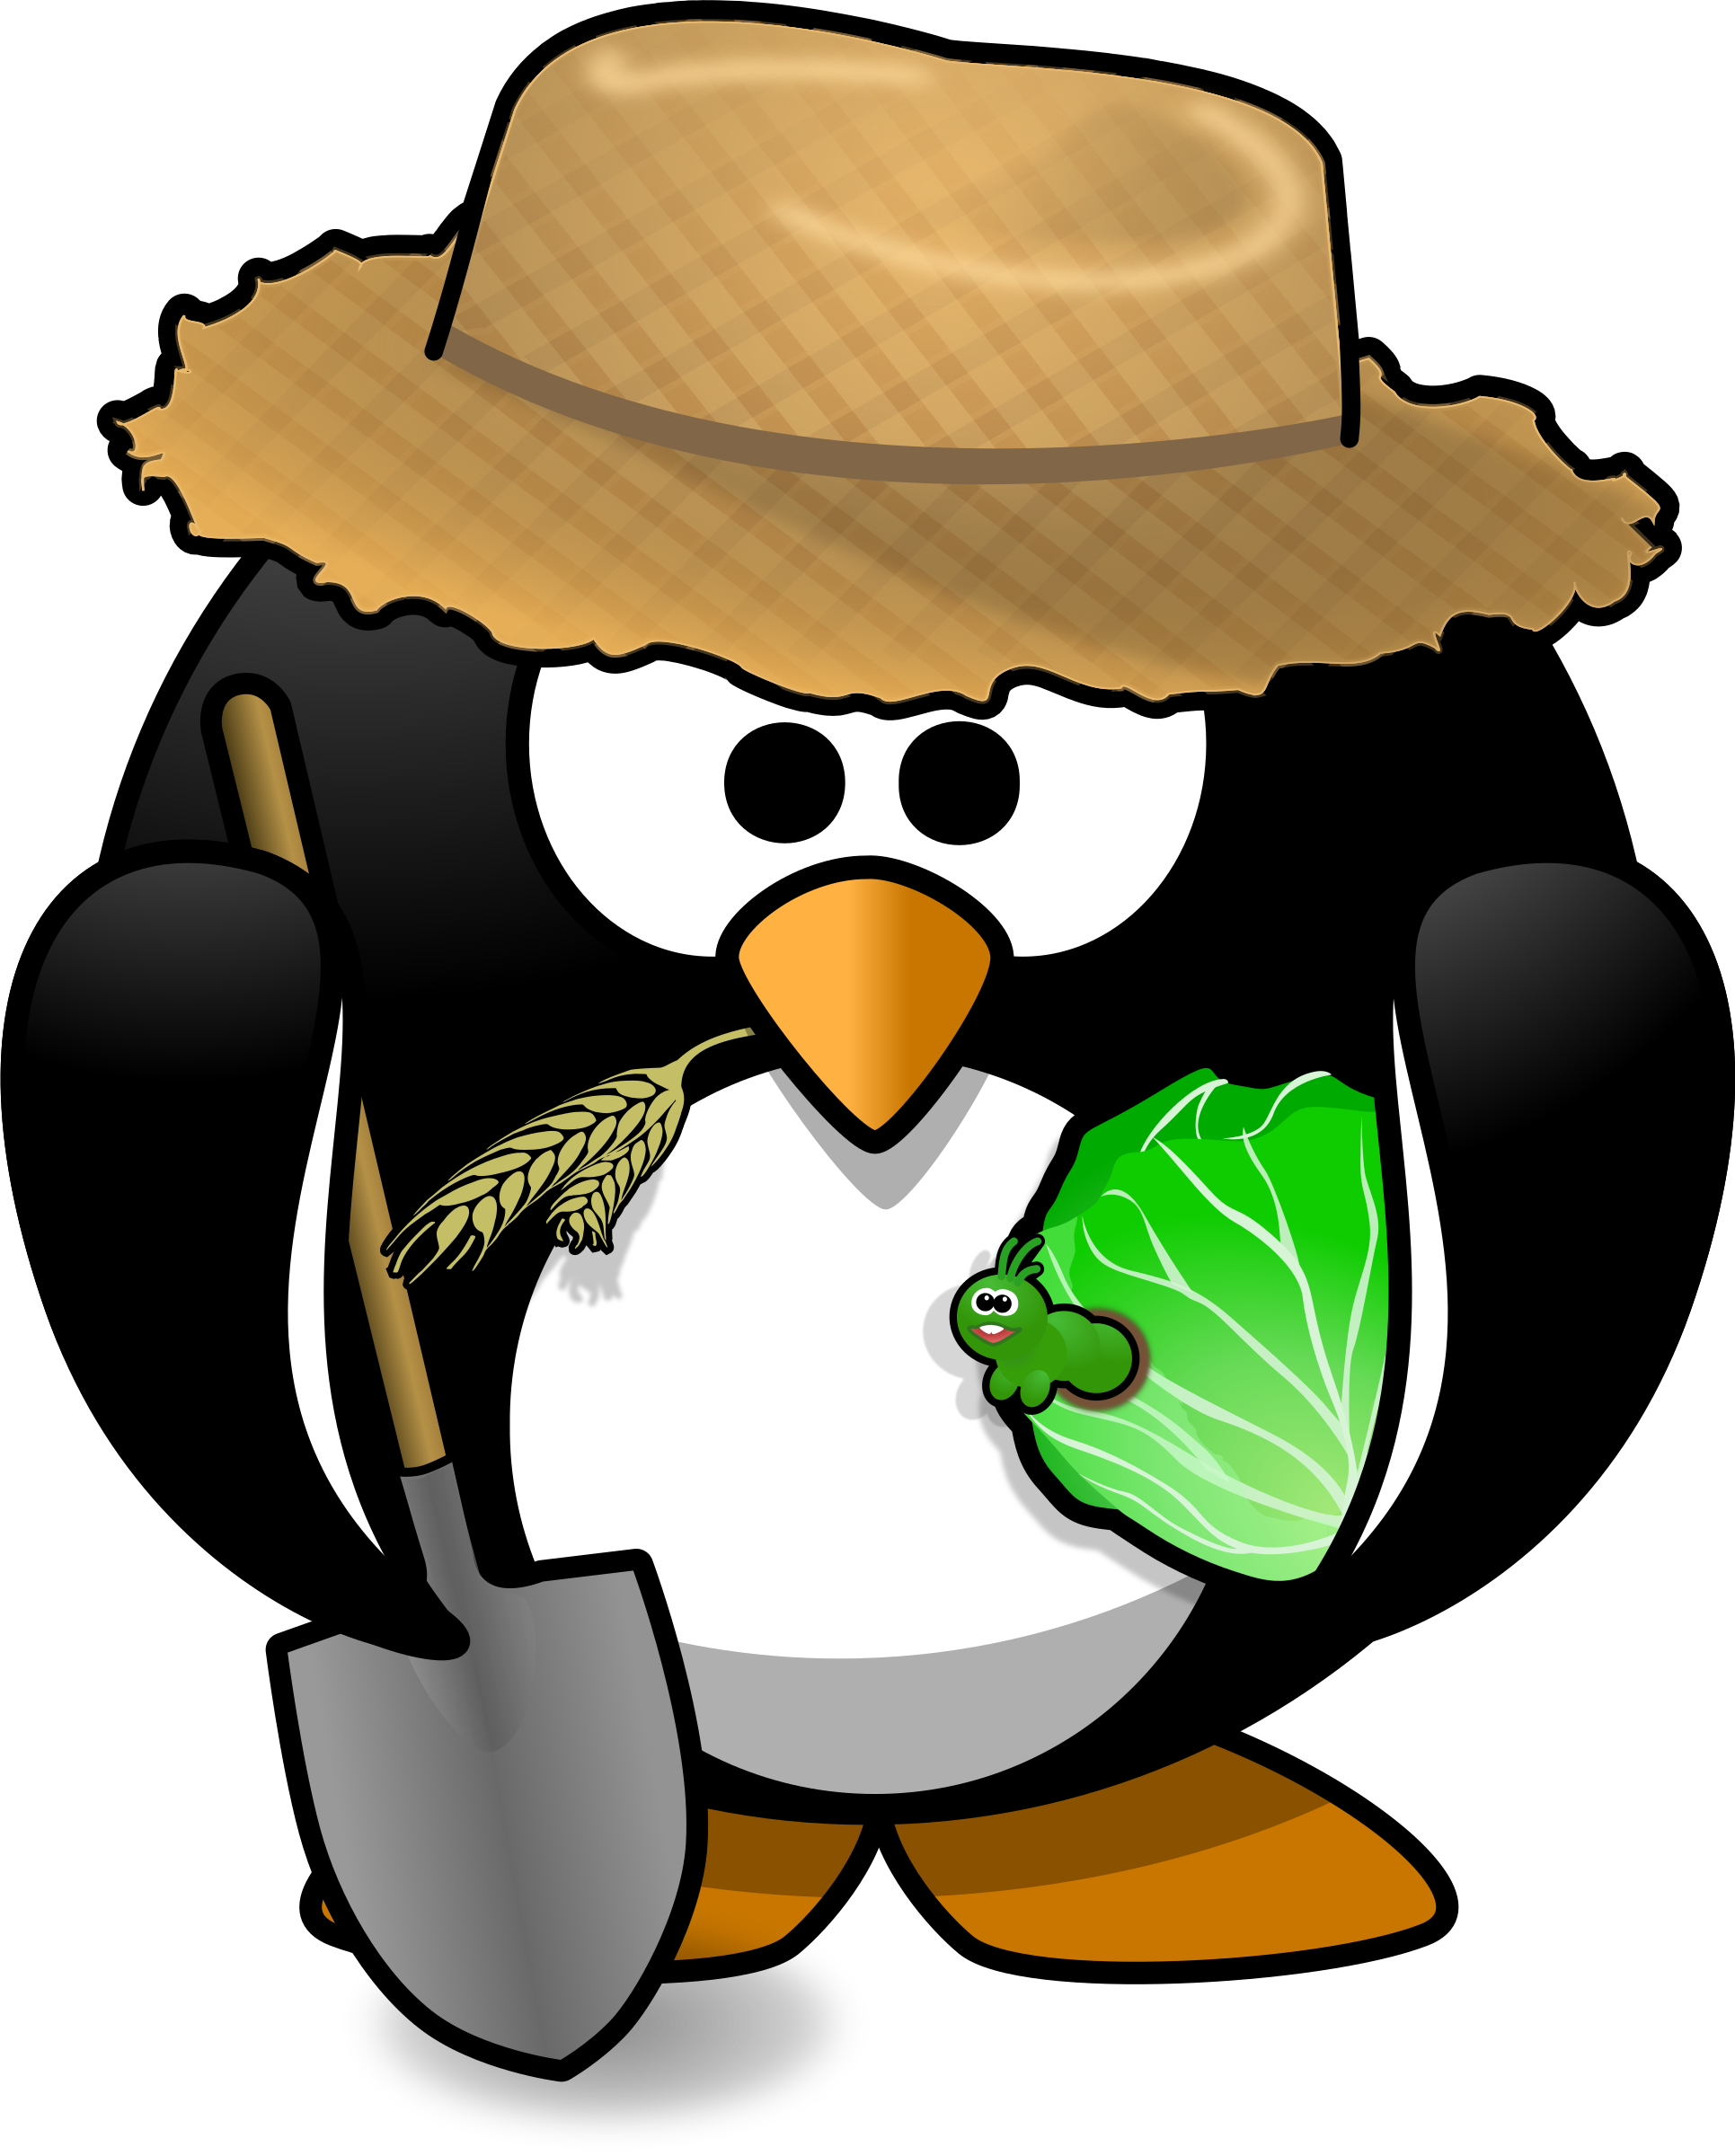 Free penguin high resolution. Farmer clipart garden